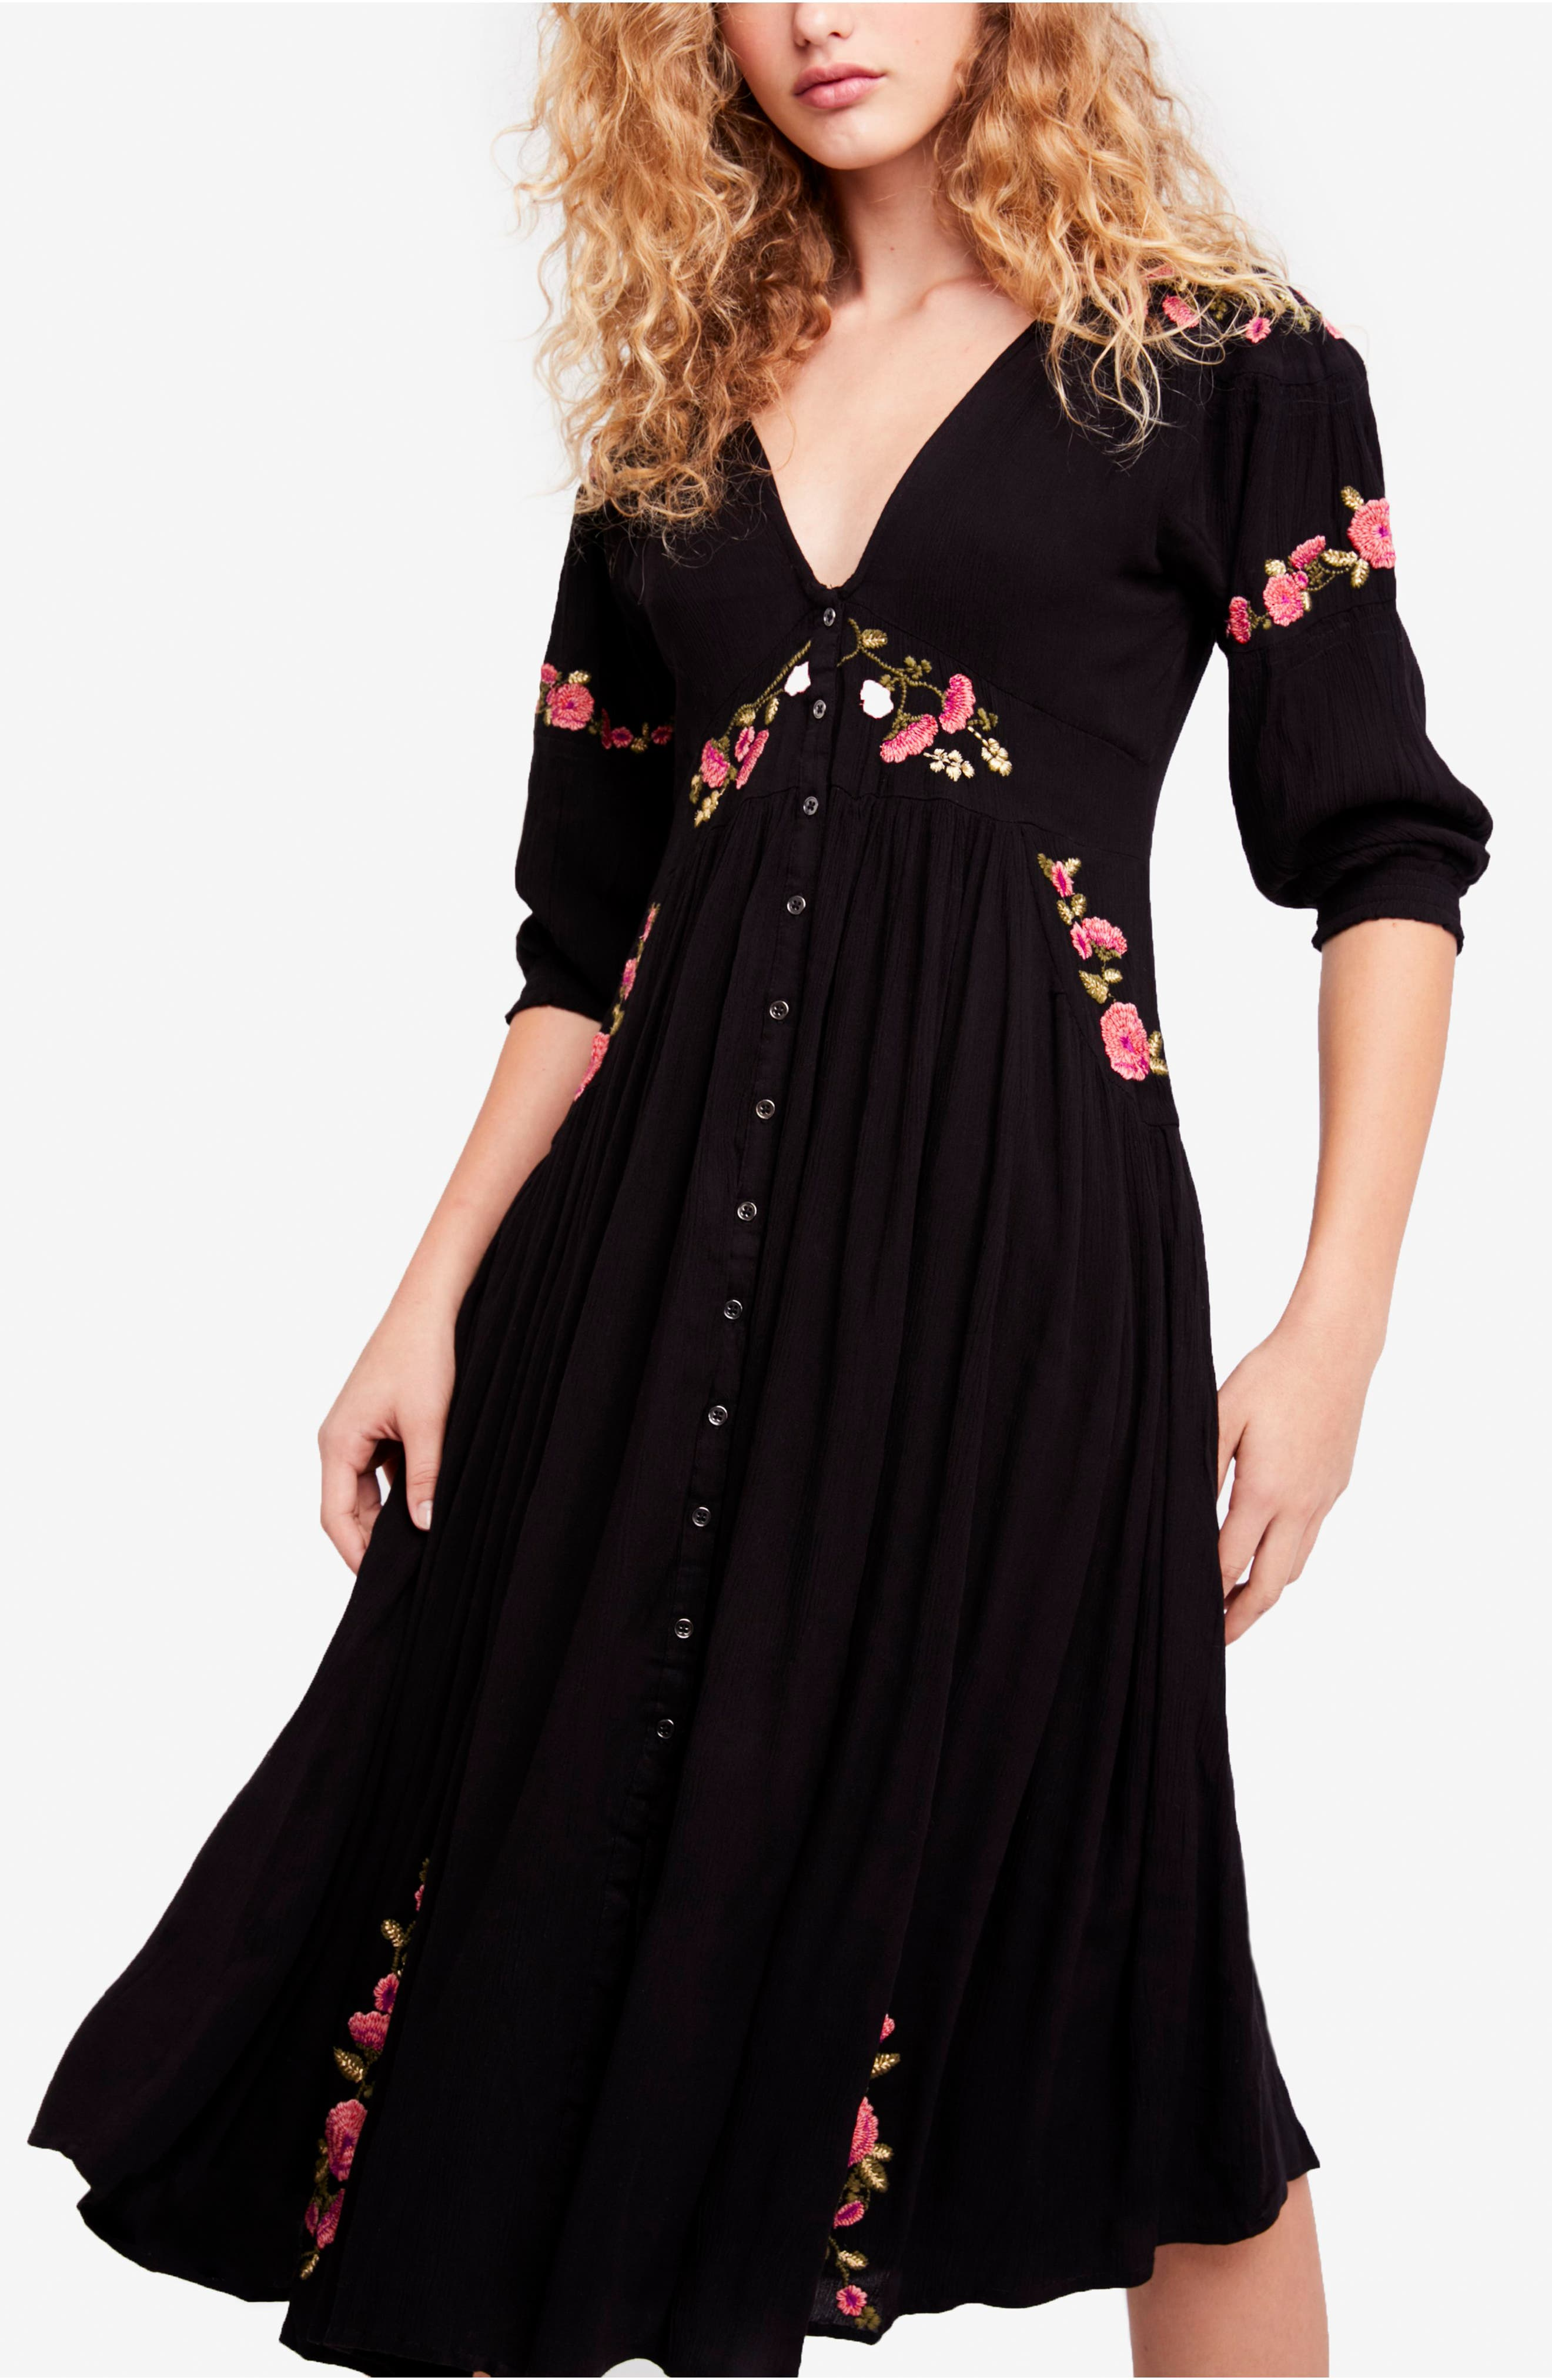 Day Glow Midi Dress,                             Main thumbnail 1, color,                             Black Combo